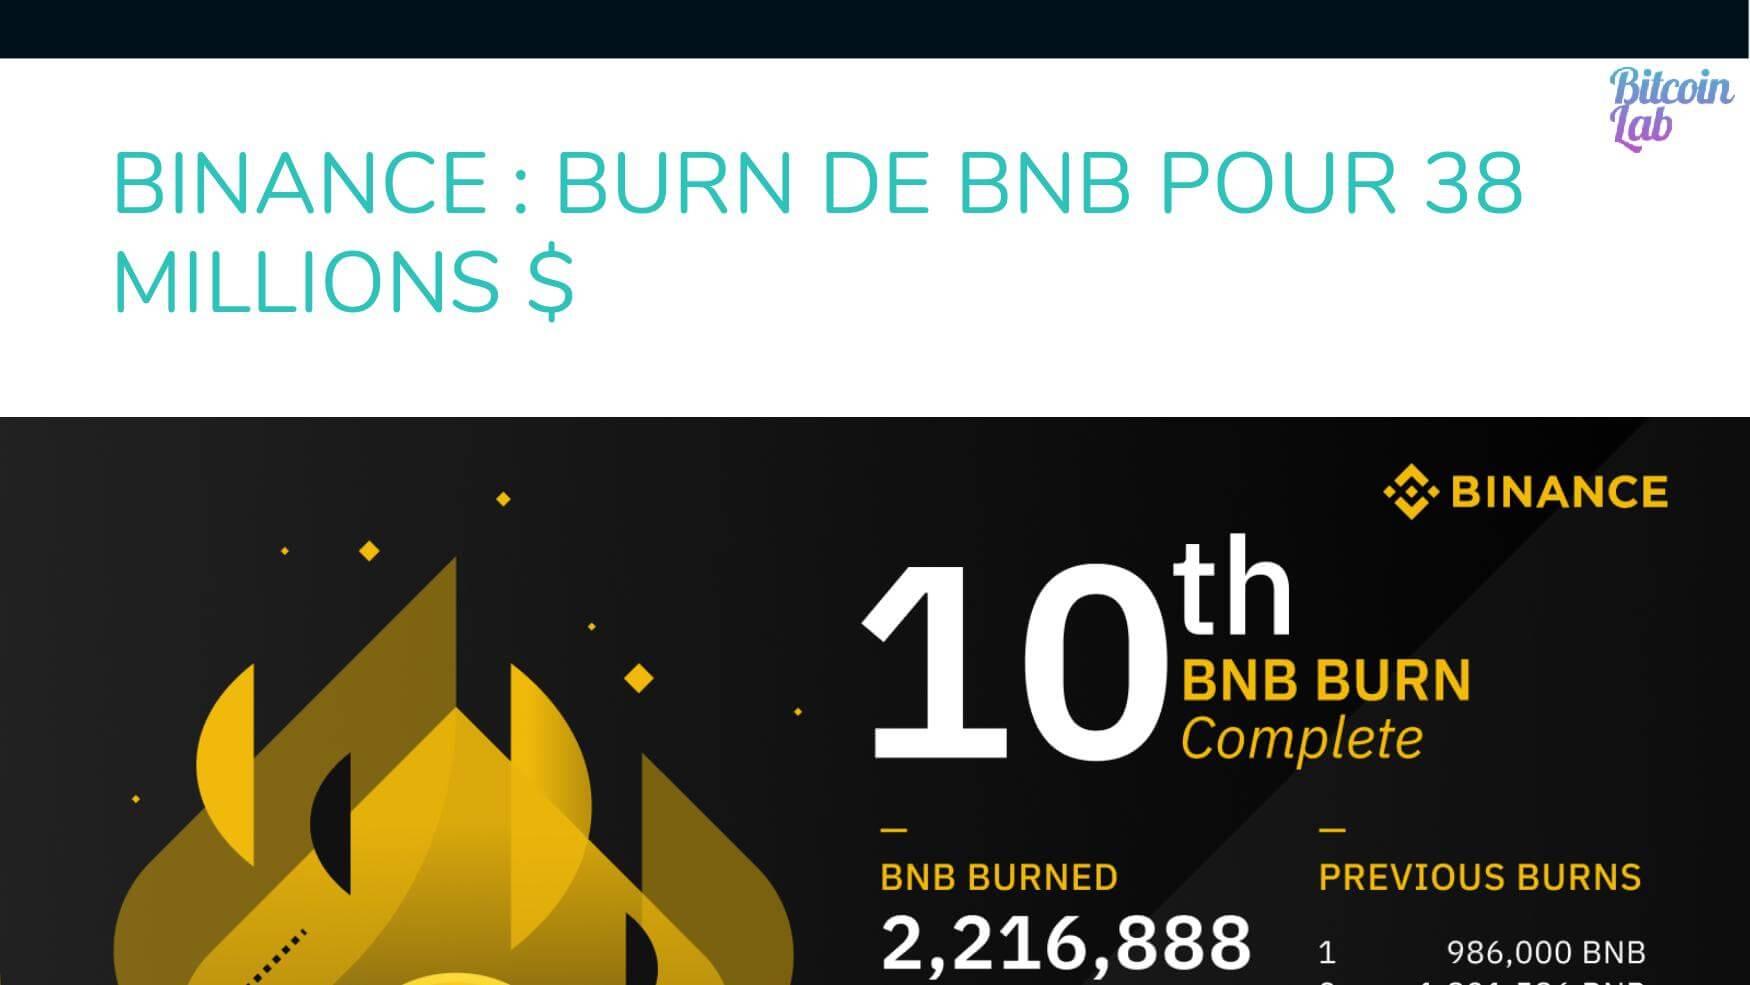 binance-burn-bnb-annonce